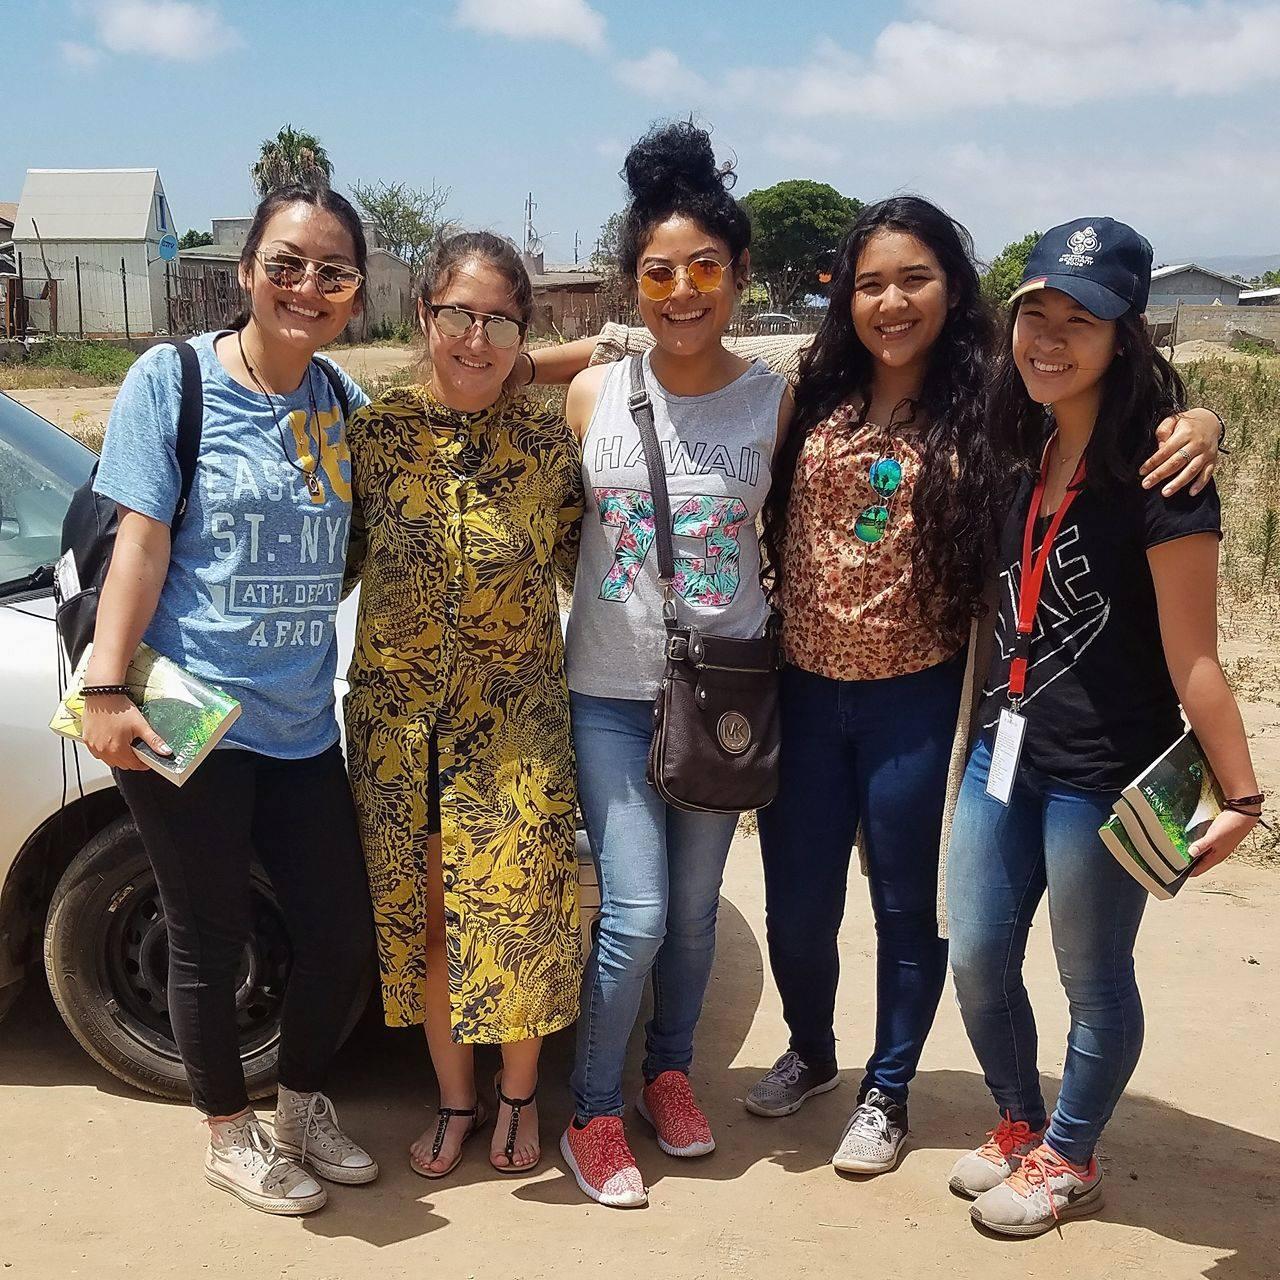 Destiny, Karla, Deborah, Genesis, and me!